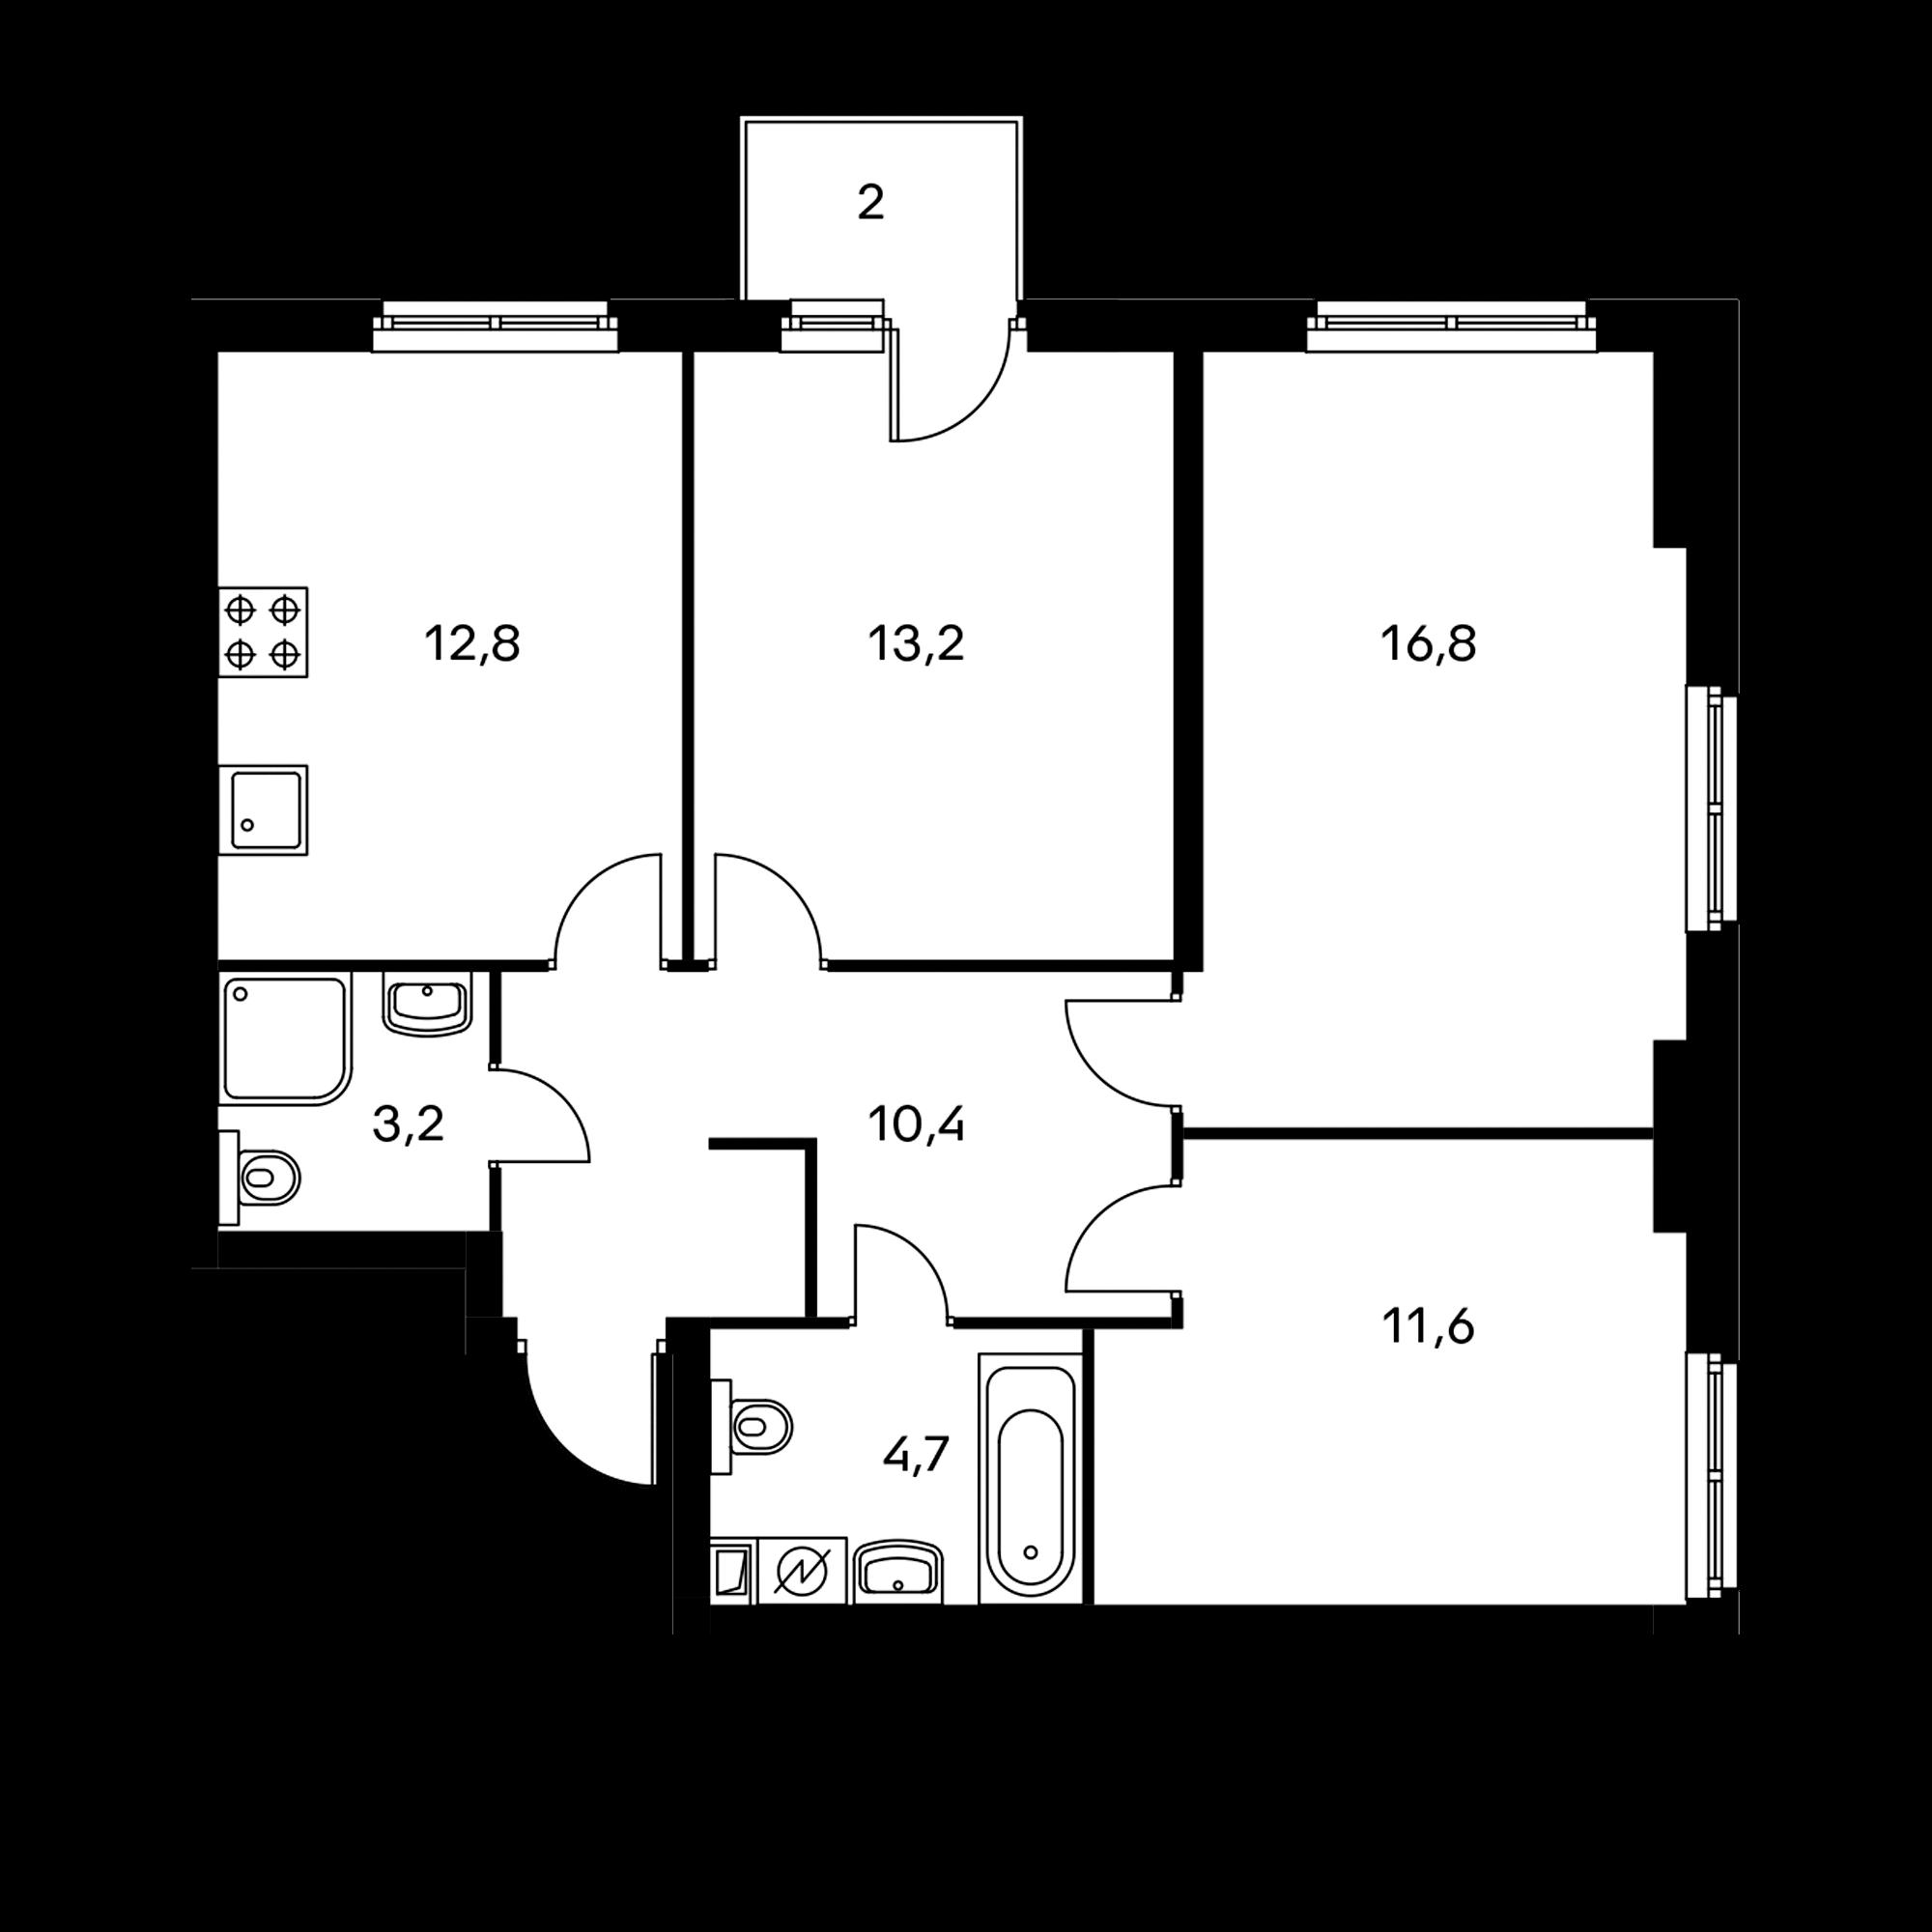 3KM1_9.9-B1